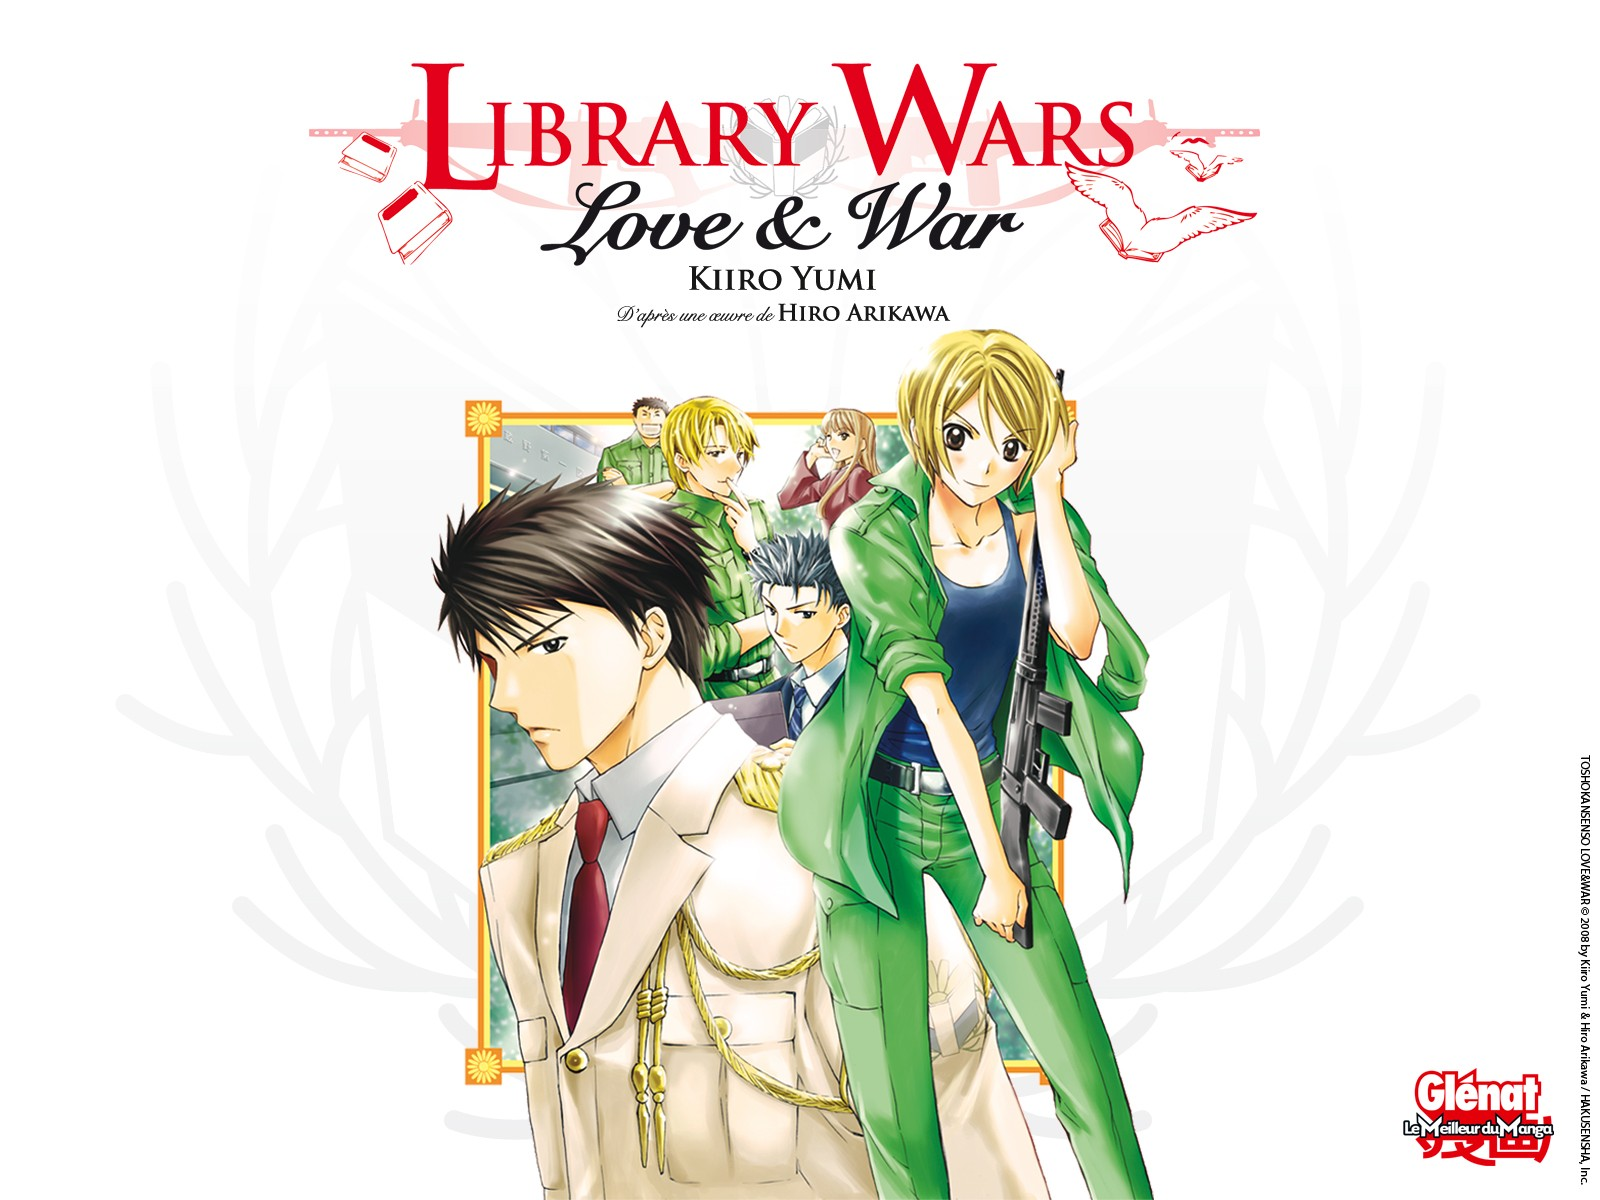 Library wars fond ecran1 1600x1200